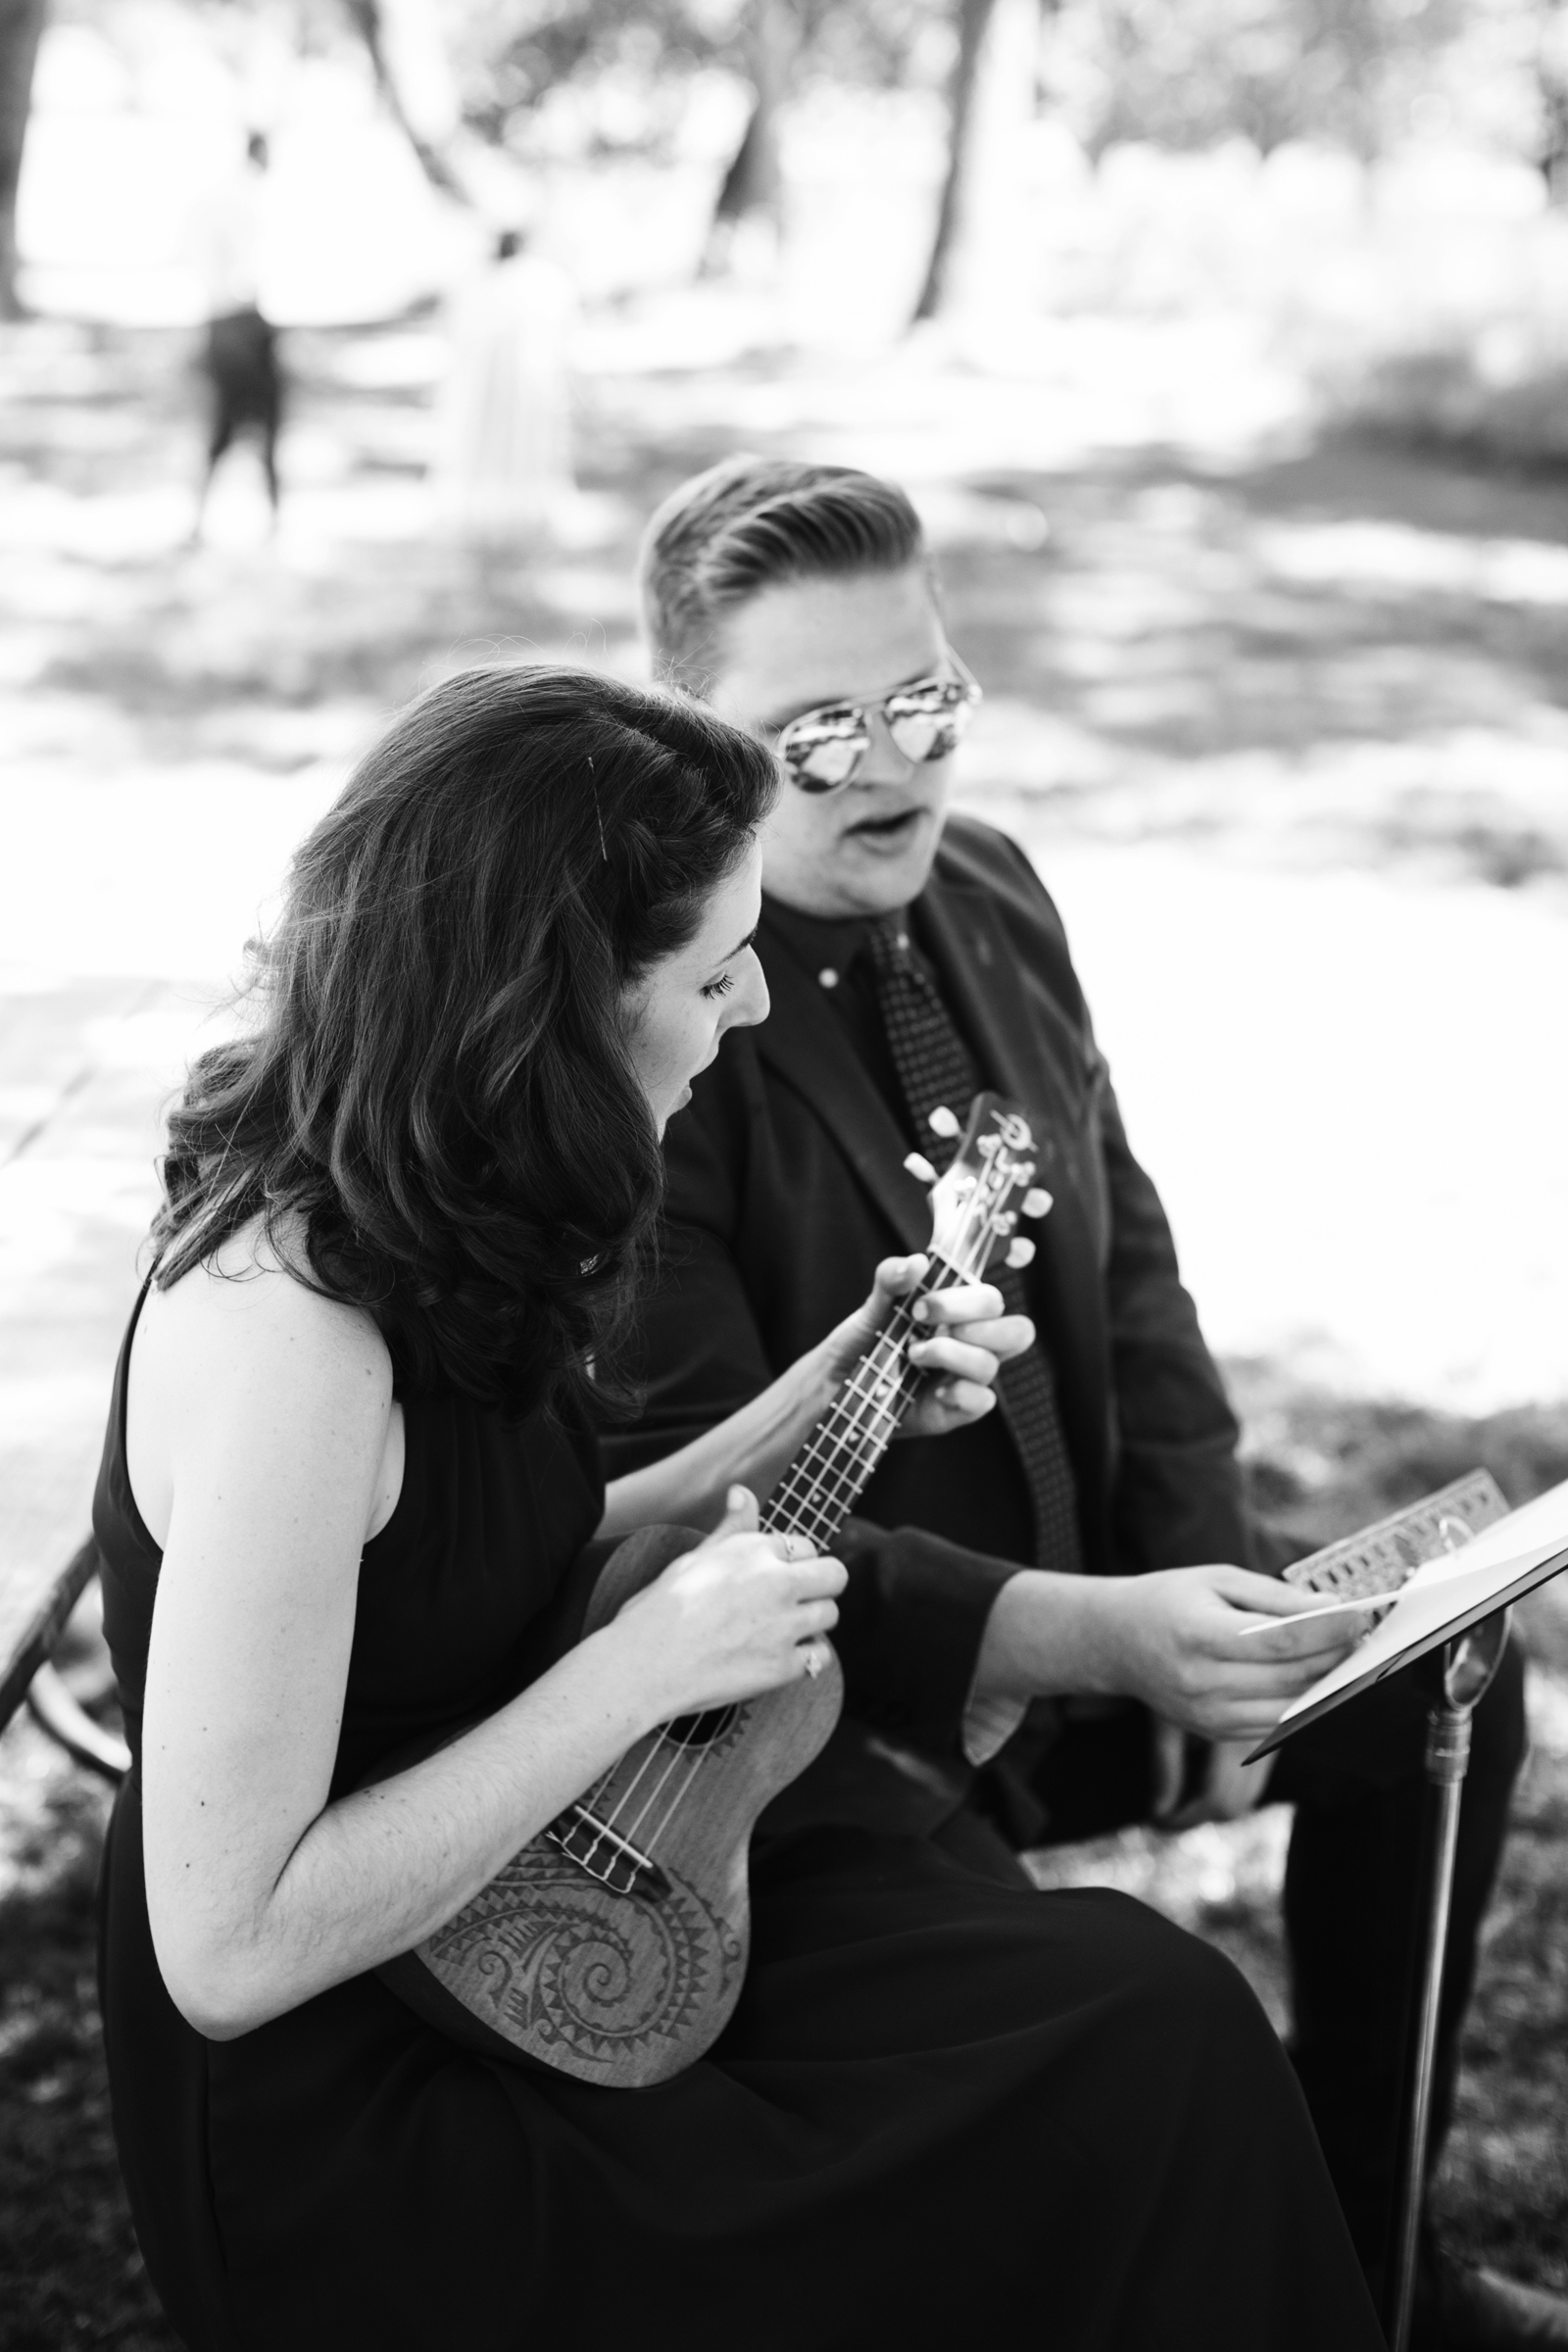 039-daronjackson-rachel-michael-wedding-mtpisgah.jpg